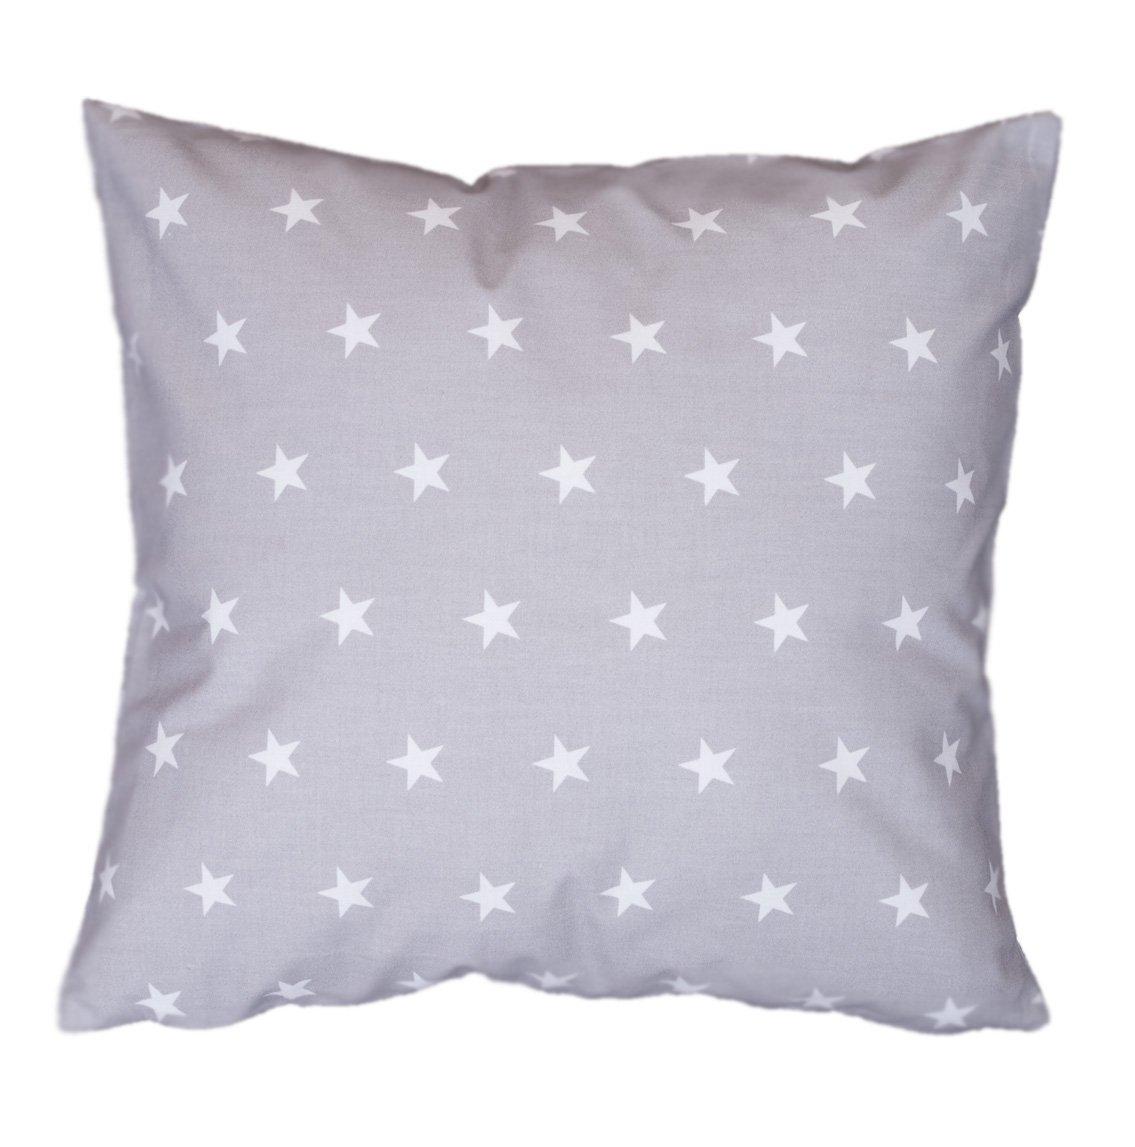 Amilian® Handcrafted Decorative Plush Filled Art-Deco Star Print Grey/White 100% Cotton Premium Quality Durable Throw Cushion Pillow 40 cm x 40 cm